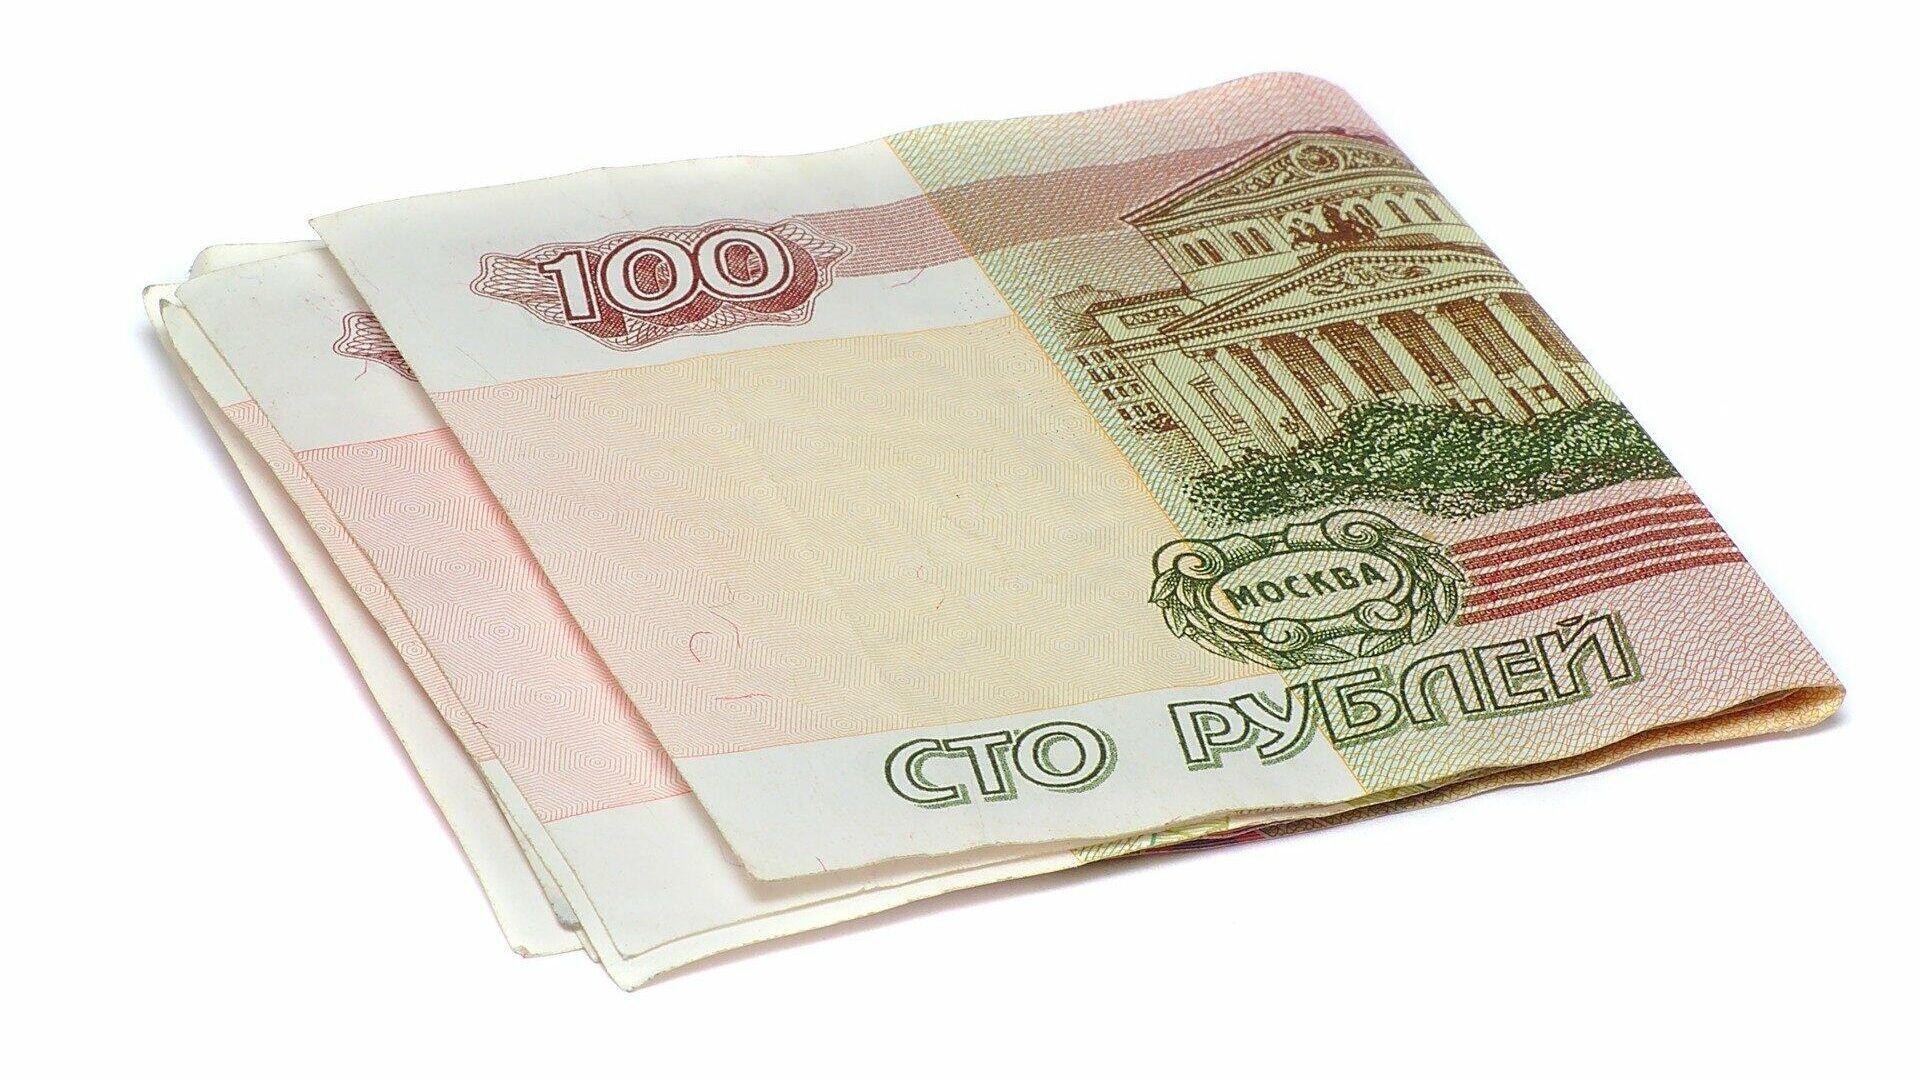 Купюры номиналом сто рублей - Sputnik Таджикистан, 1920, 11.10.2021